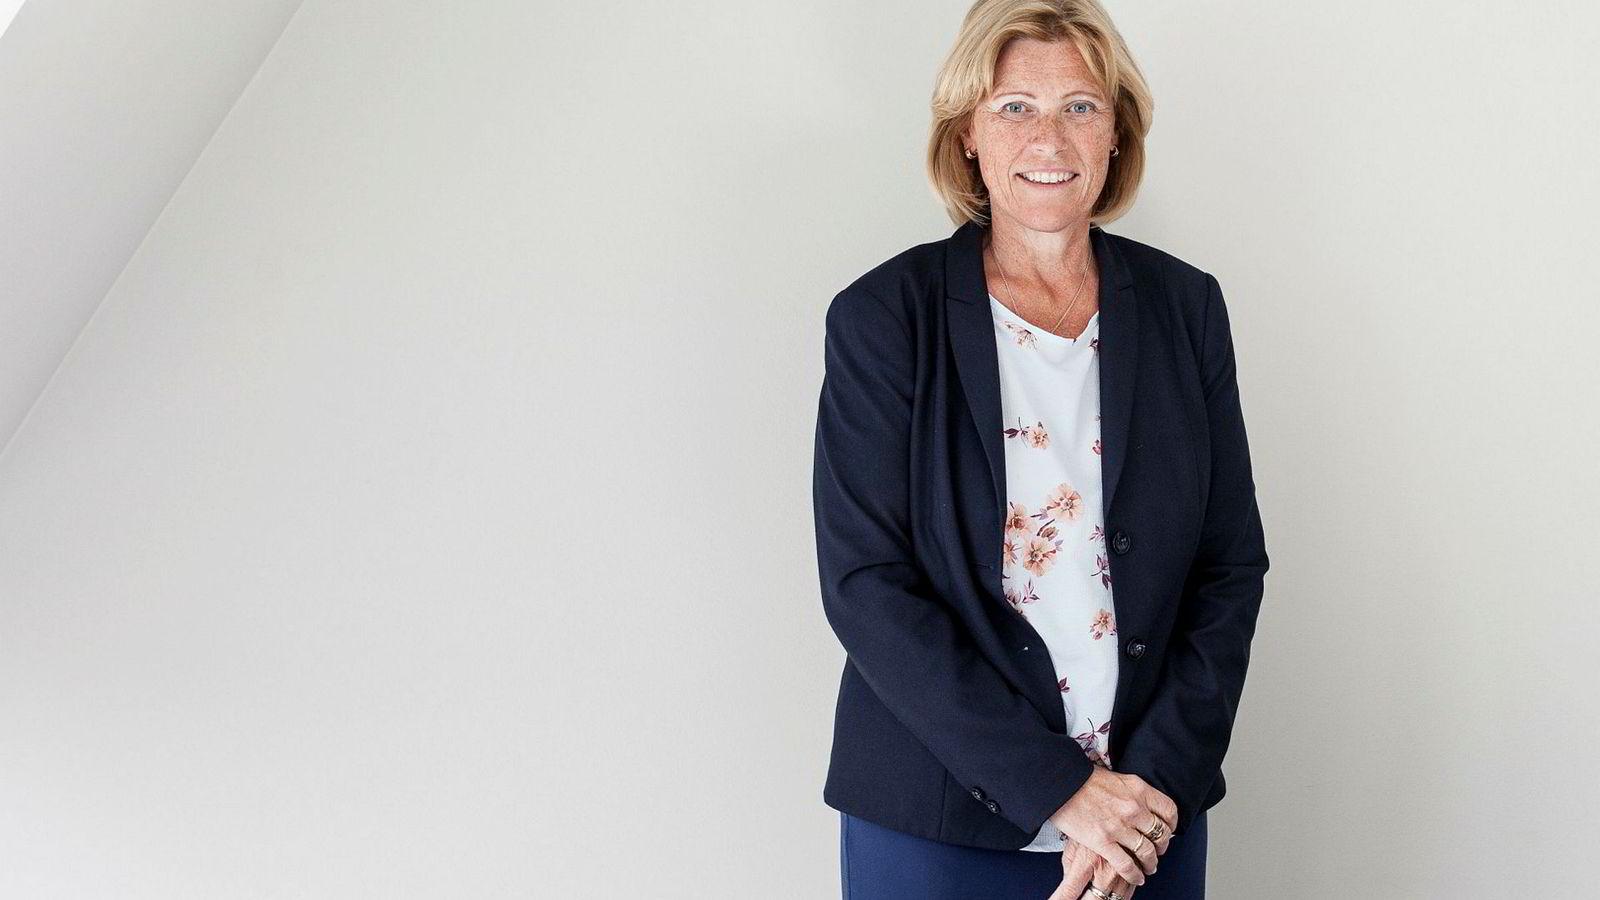 Anne Marit Panengstuen blir ny konsernsjef i Nortura.